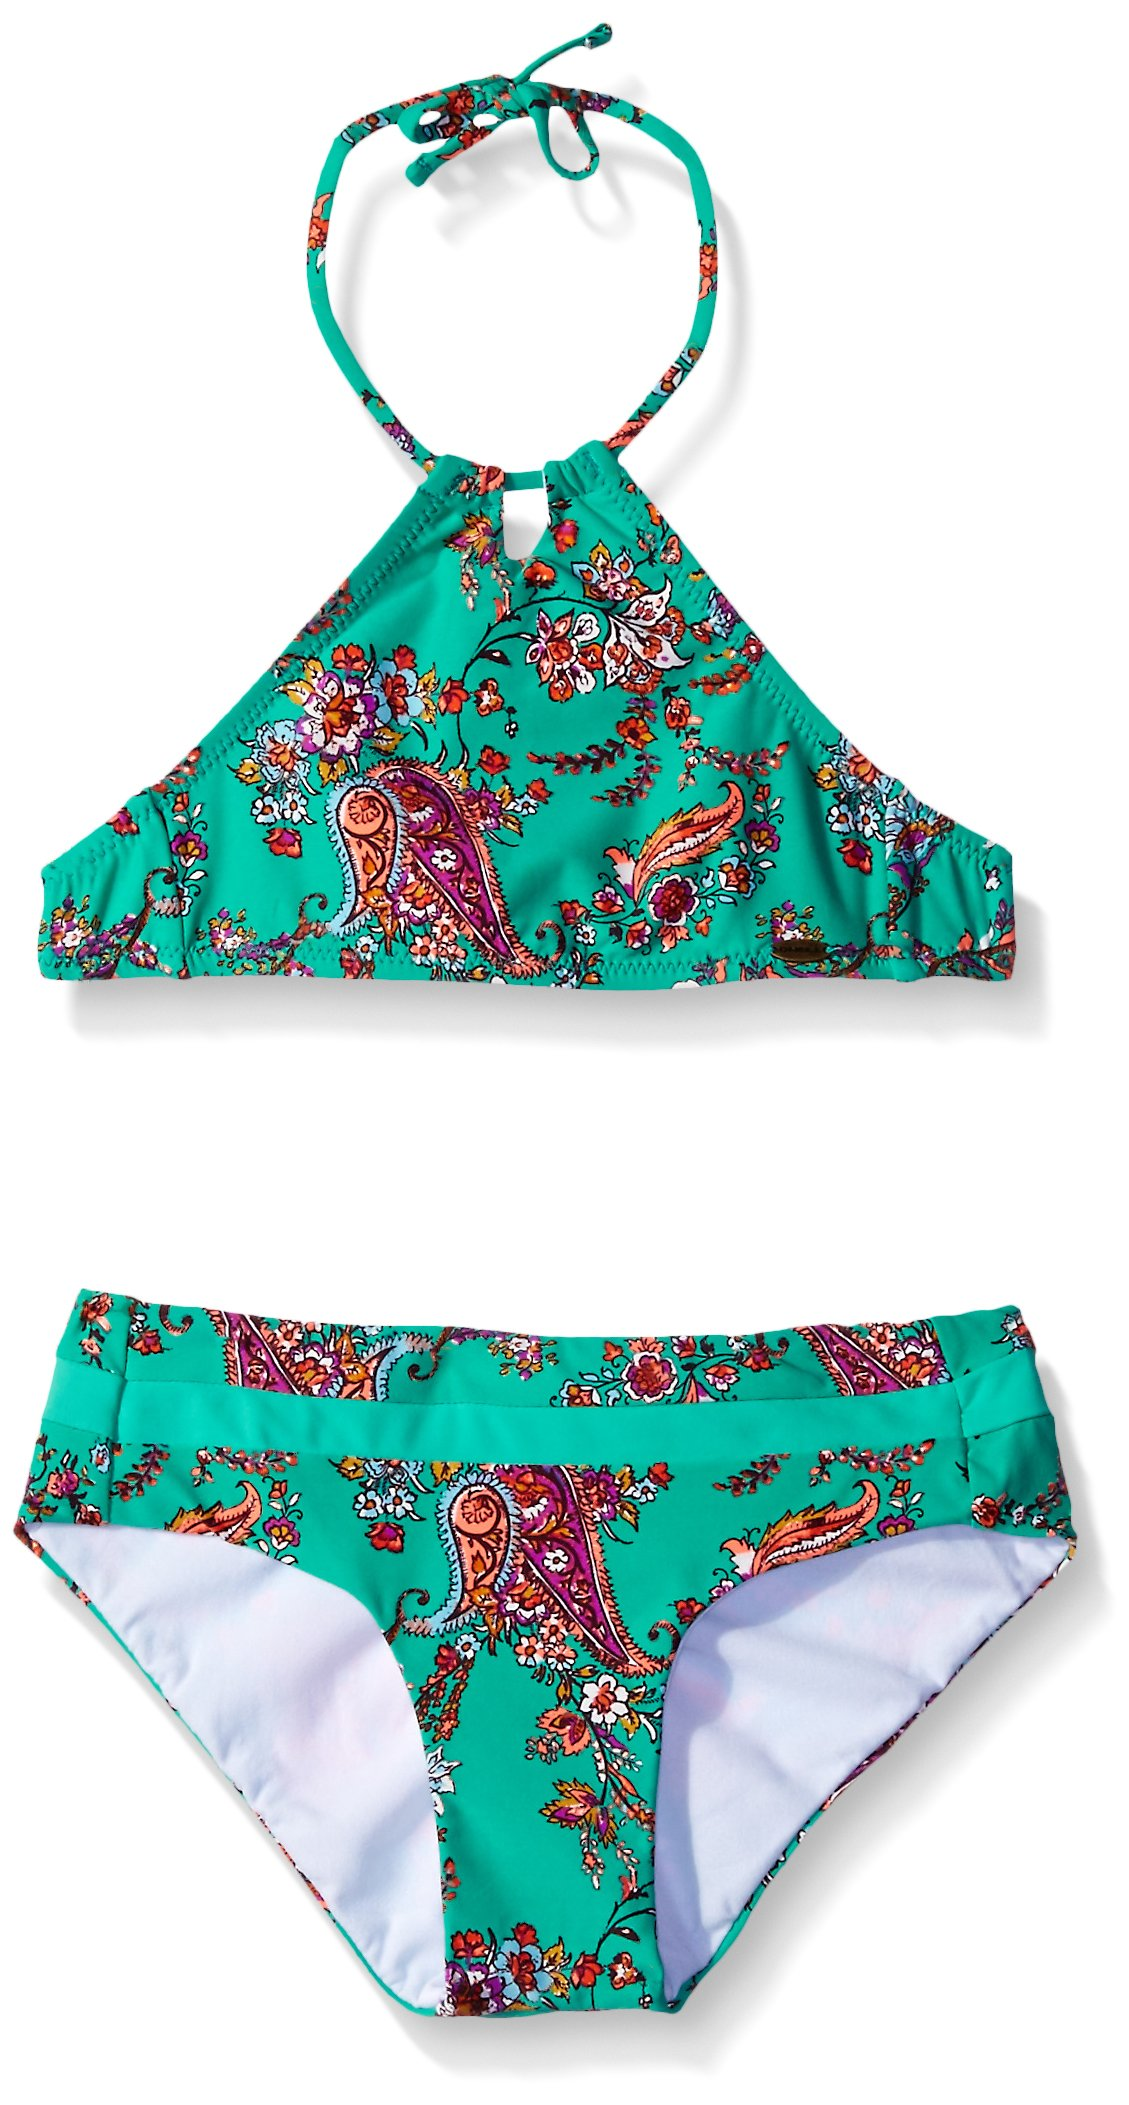 O'Neill Little Girls Bardot High Neck Halter Bikini Top and Bottom, Sea Glass, 5